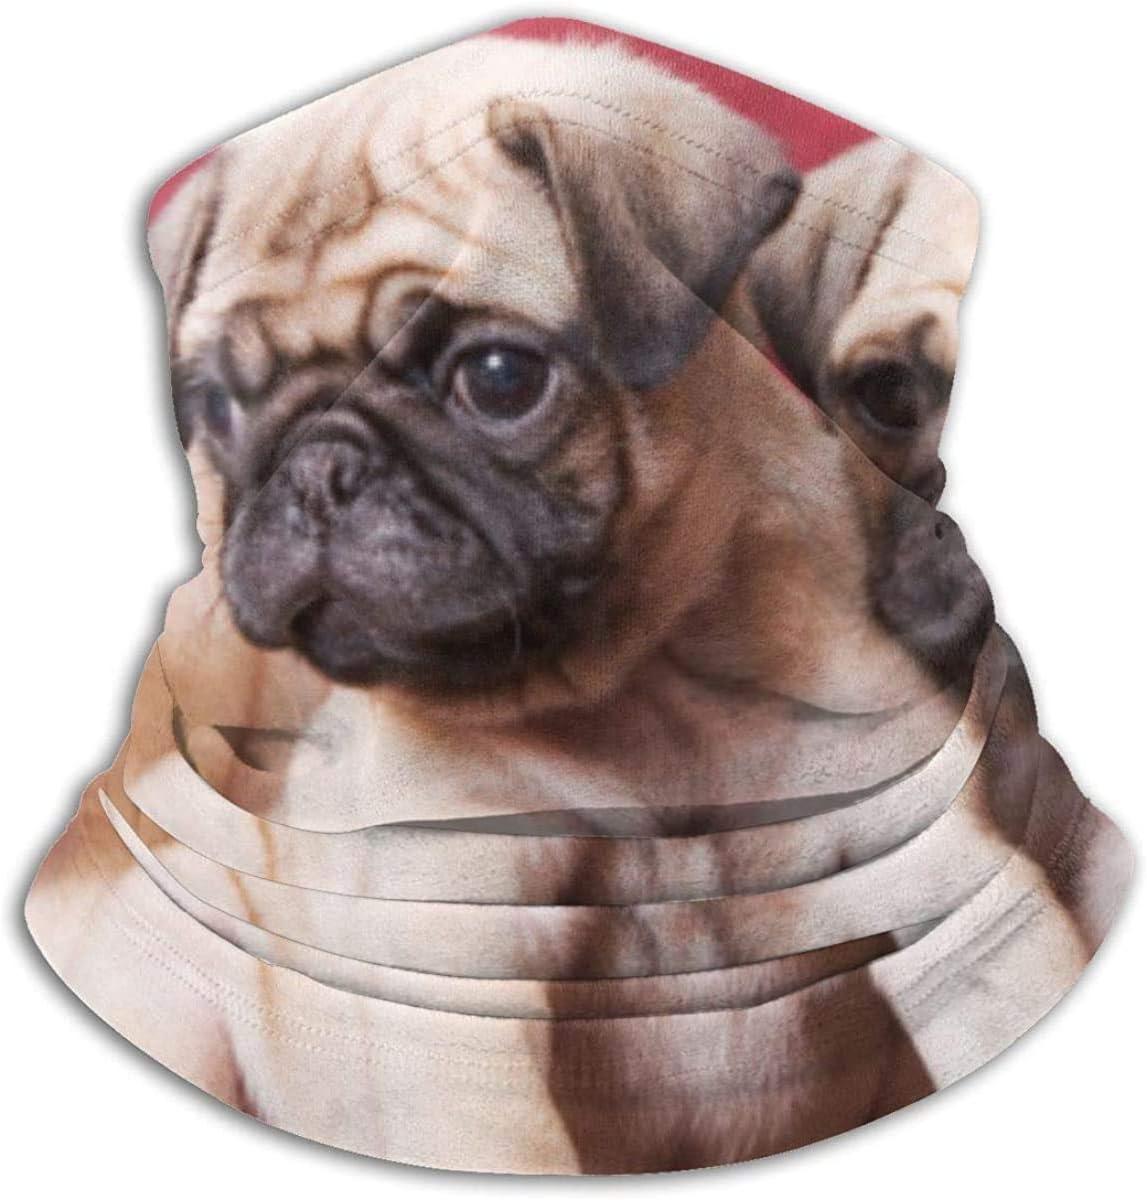 Lastbest Pugs, Sofas, Blankets, Color Photographs Print Neck Warmer Multifunction Scarf Hat Neck Gaiter Neck Cap Bala Windproof Neck Heating Wrap Outdoor Sports